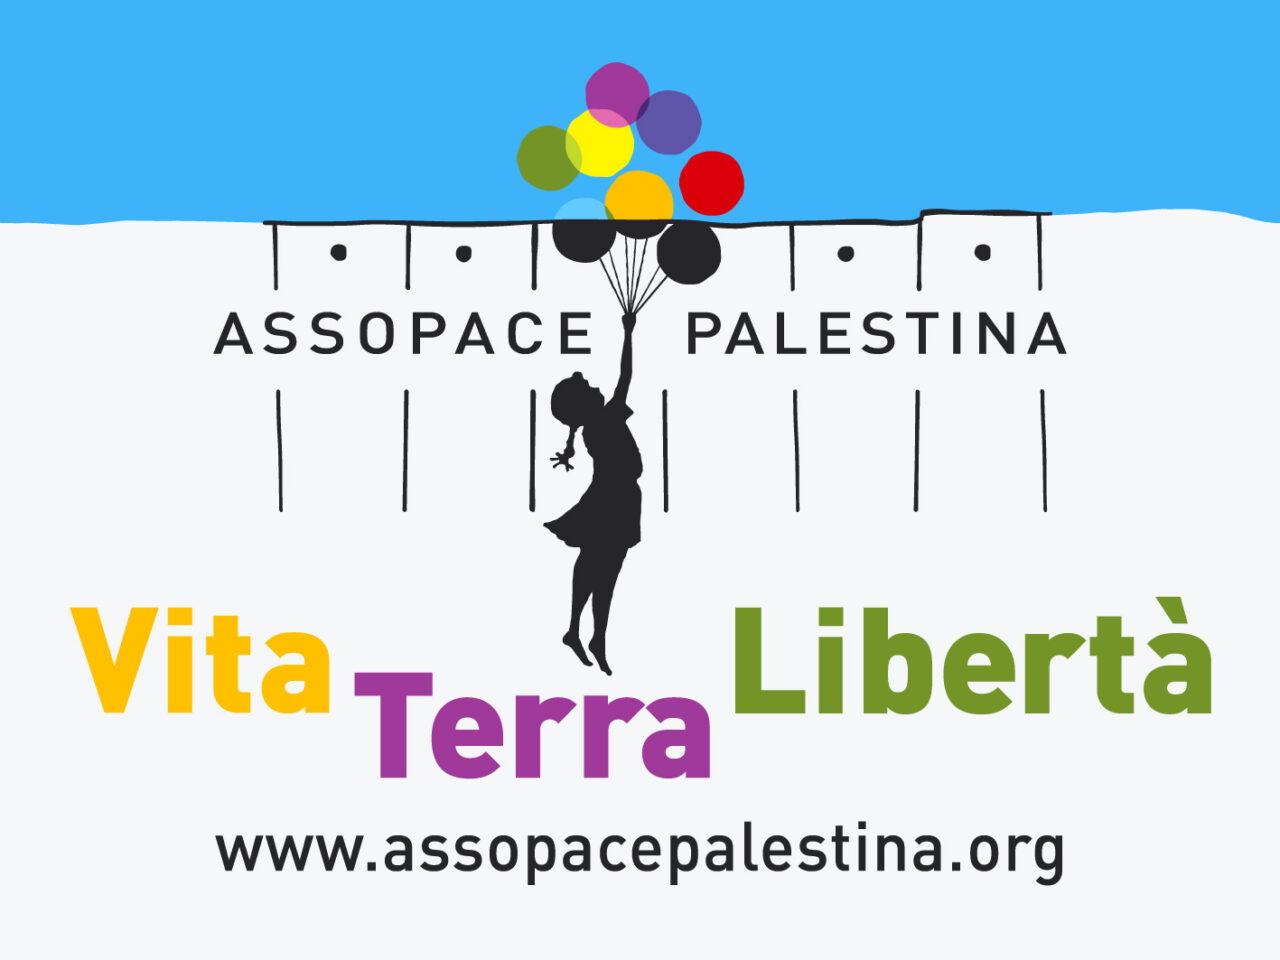 ASSOPACE PALESTINA